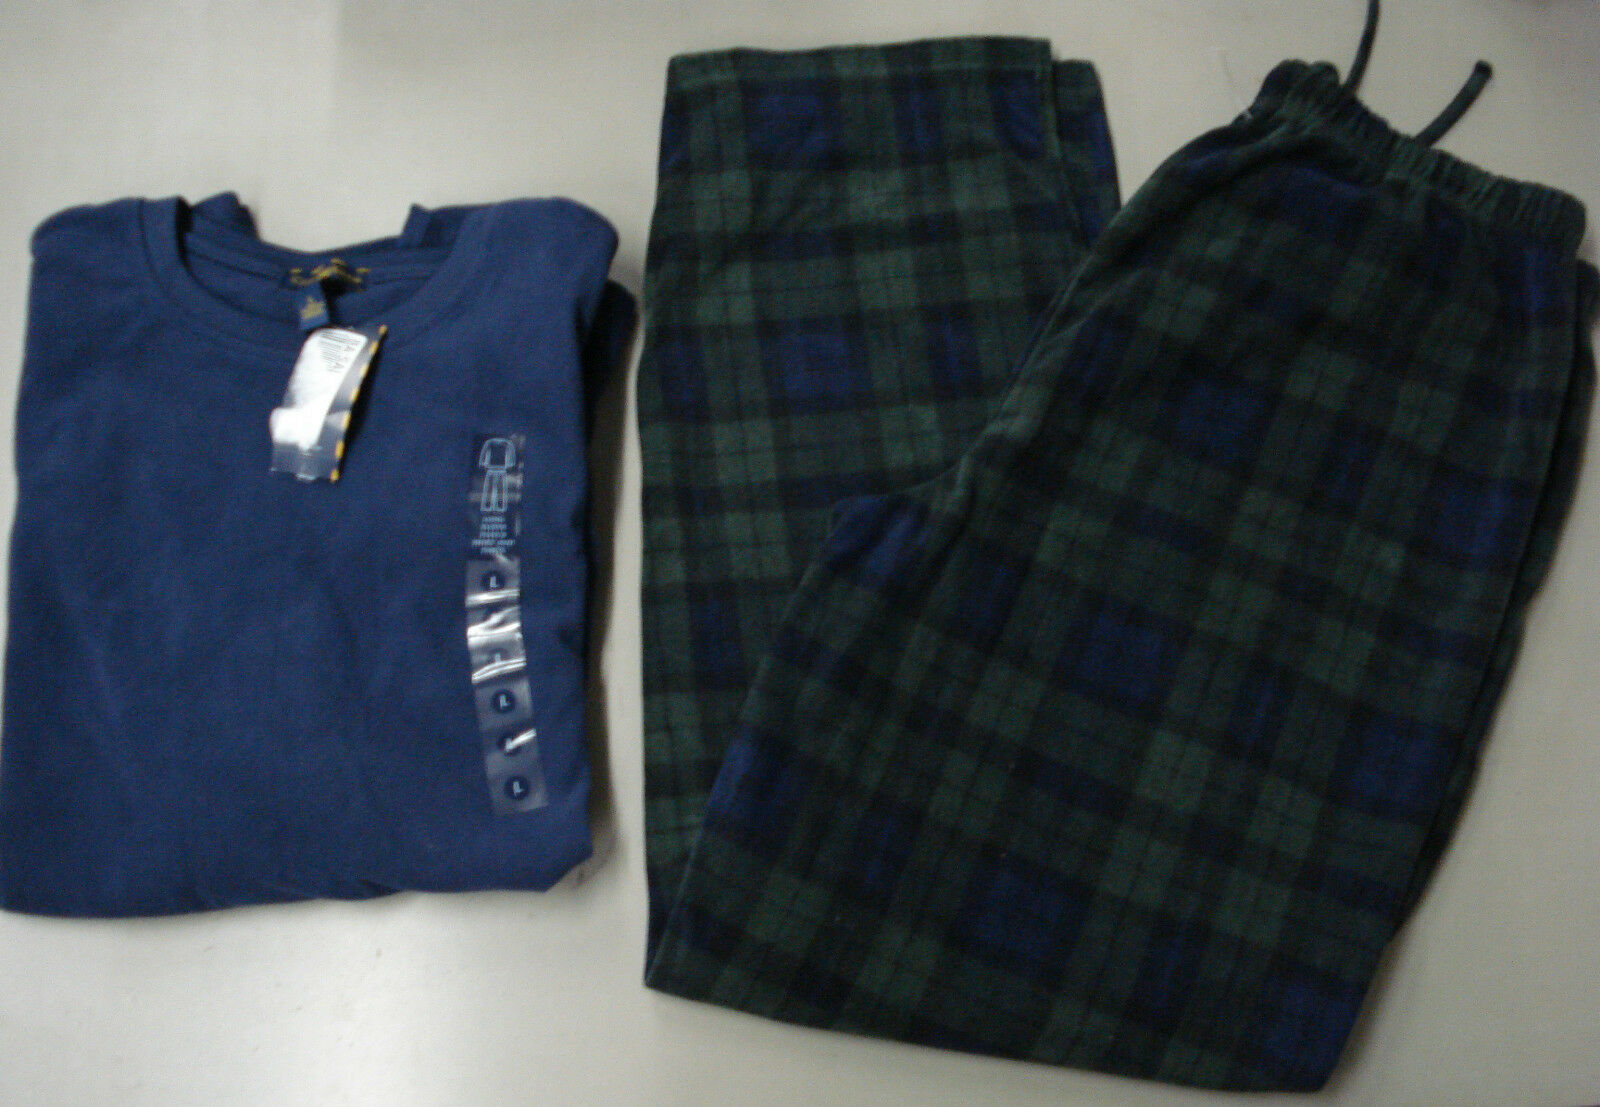 NWT Men's Club Room Fleece 2 Piece Pajama Set Size Large bluee Green SR 70.00